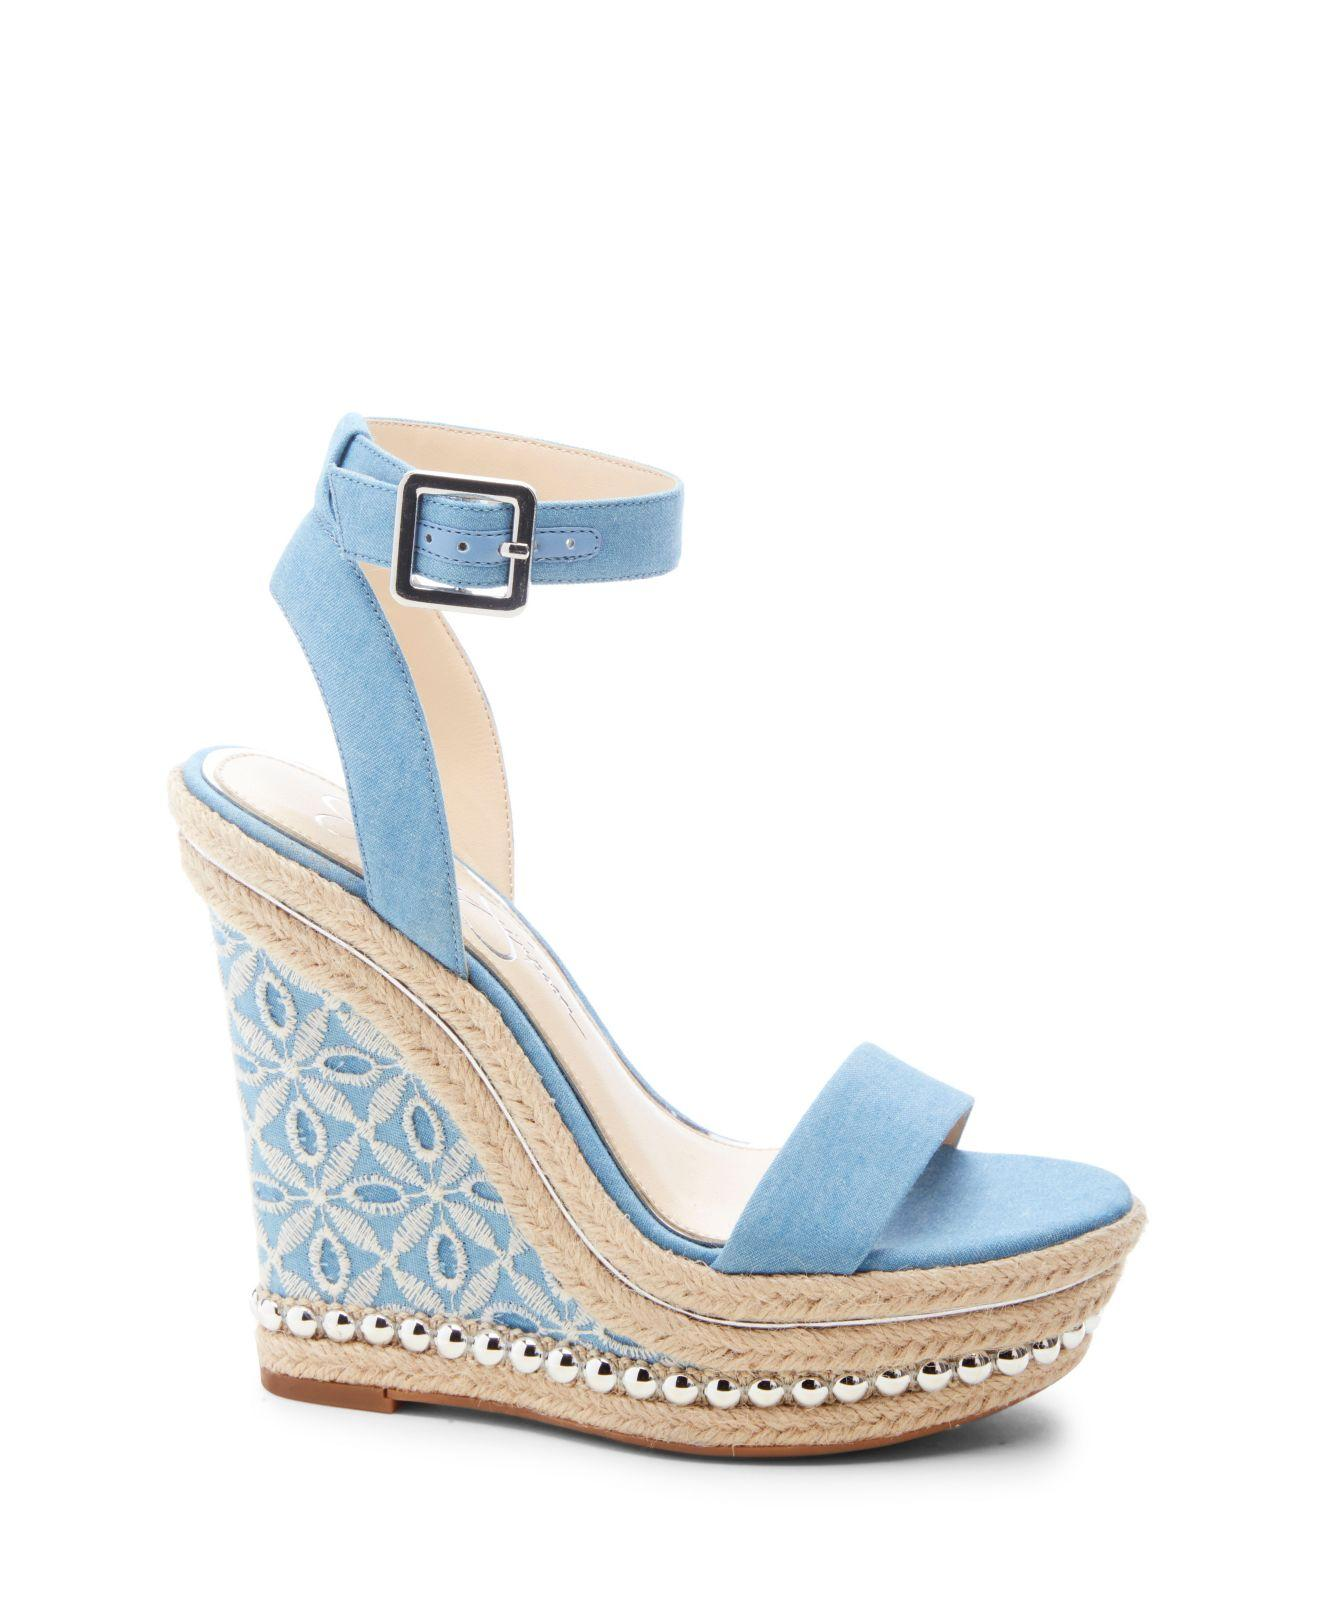 f86026d8cbf Lyst - Jessica Simpson Alinda Woven Platform Wedge Sandals in Blue